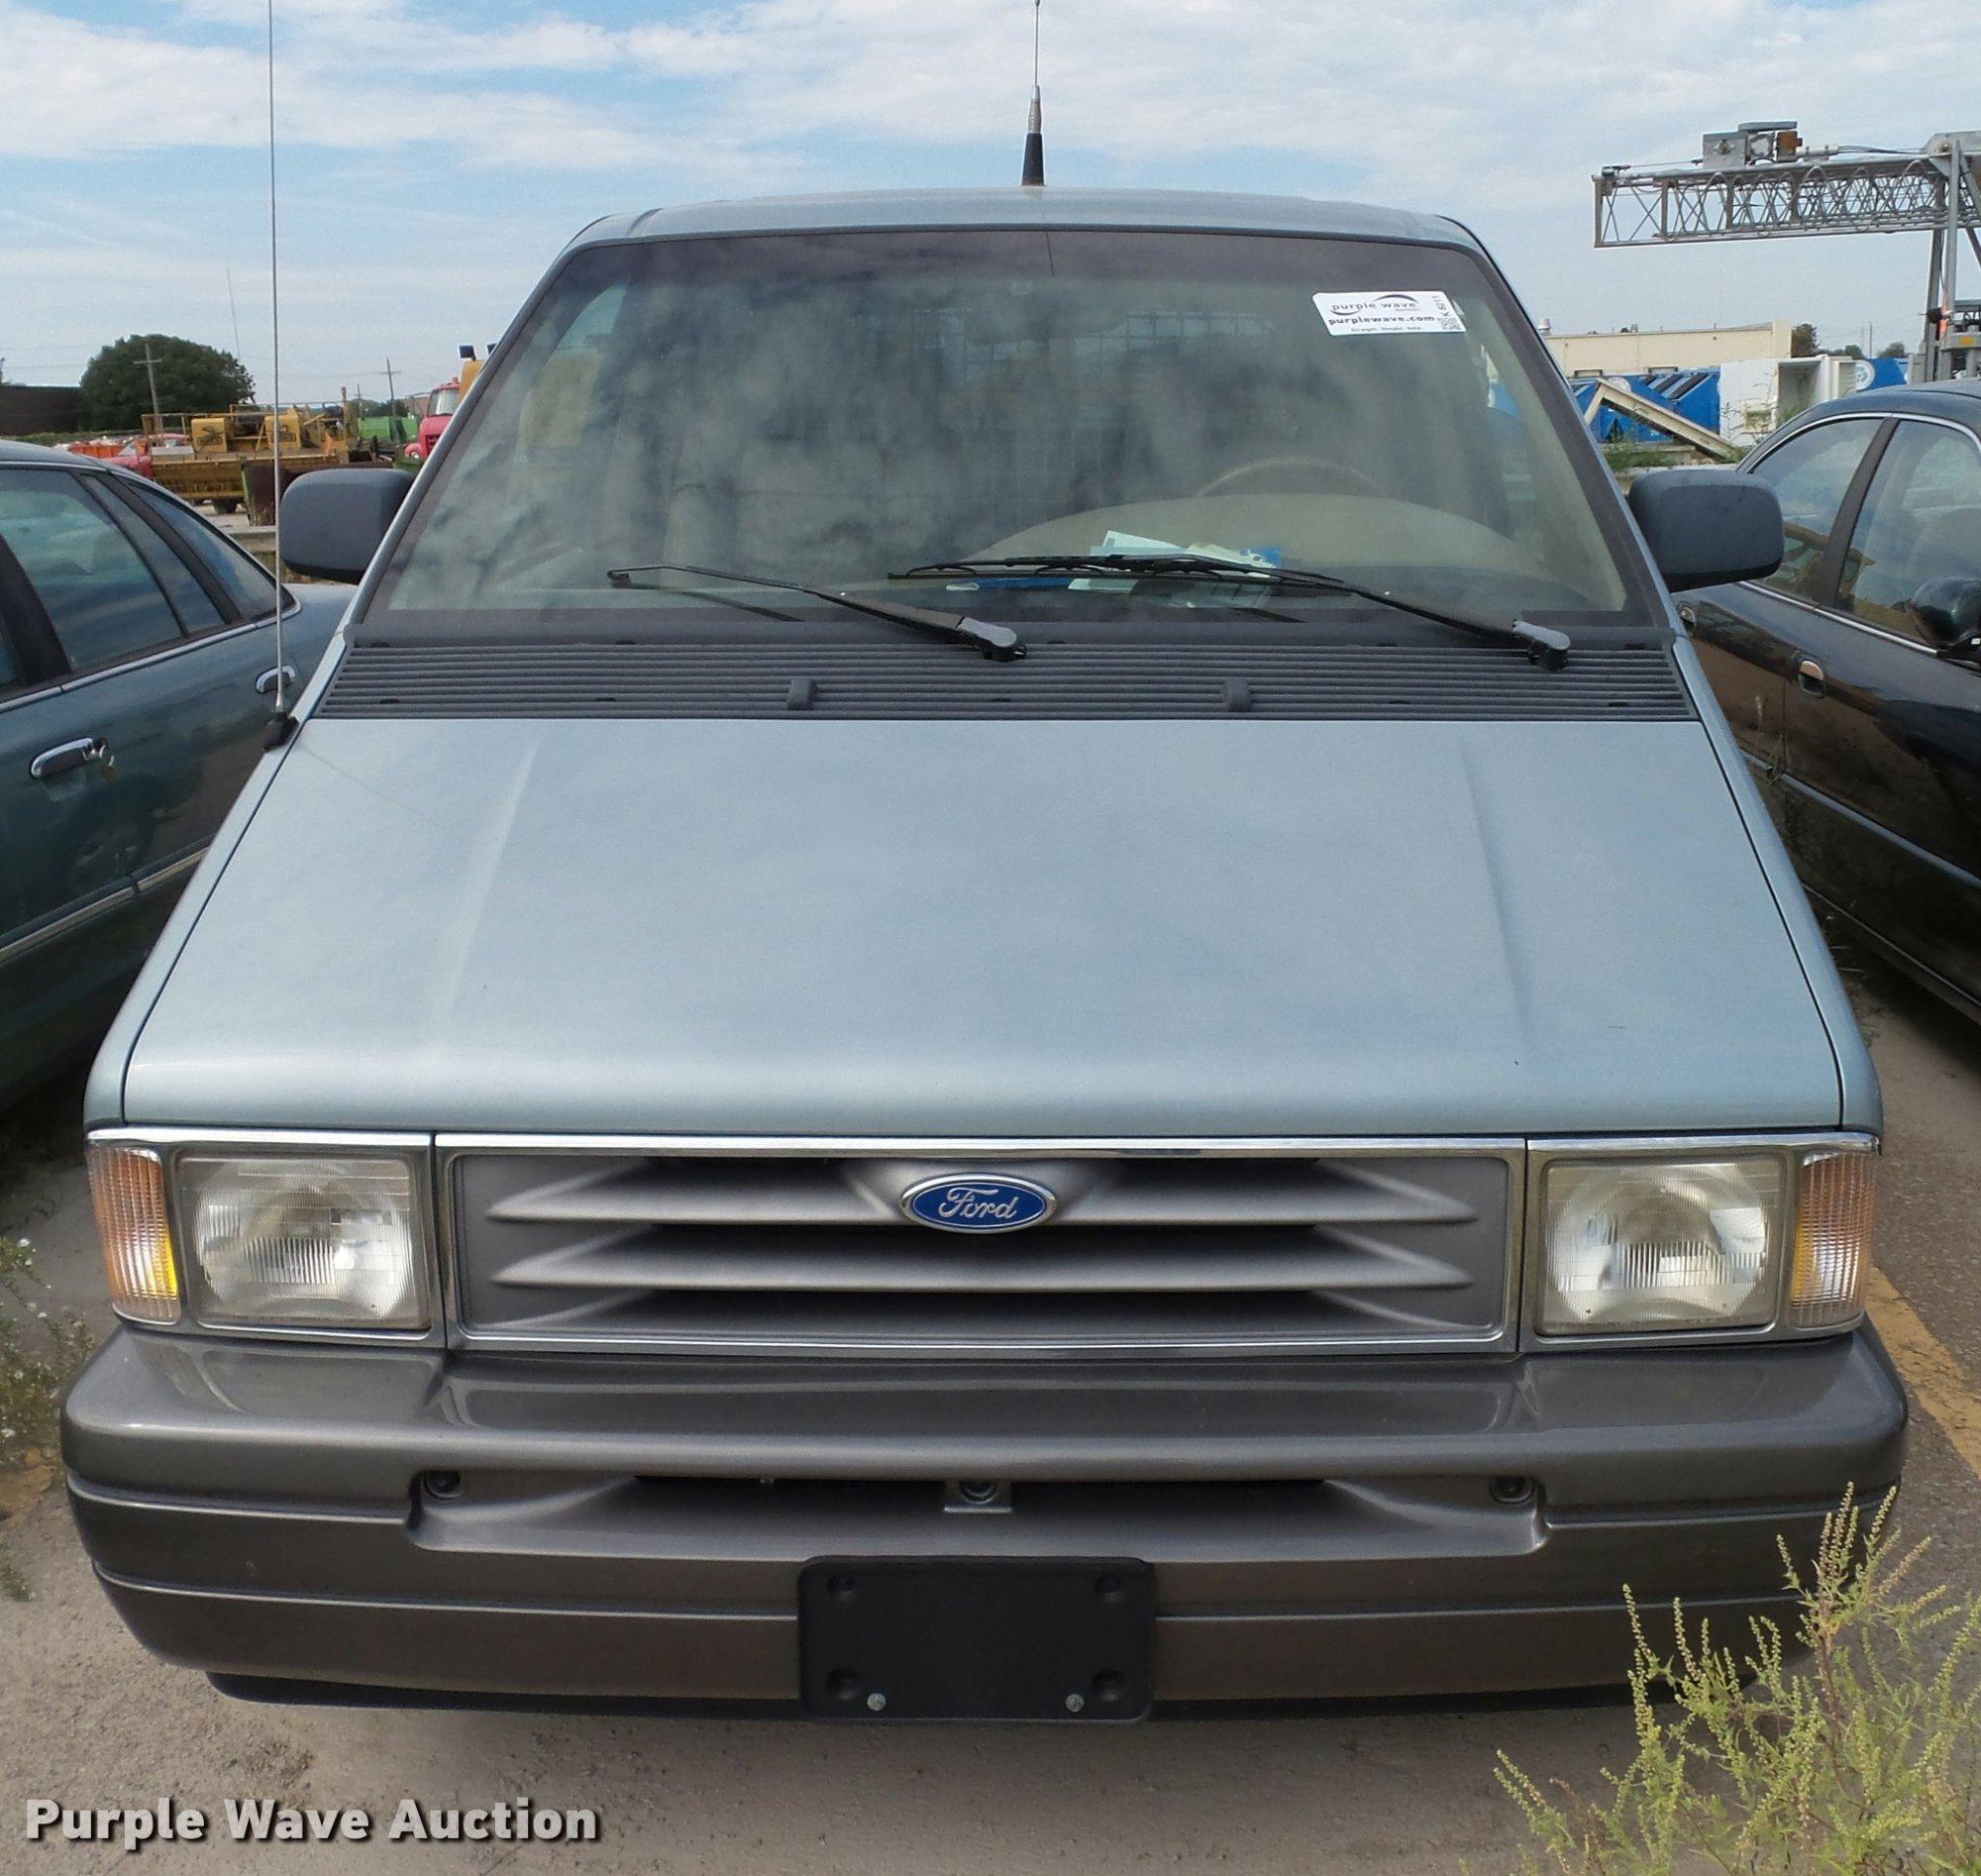 hight resolution of  1996 ford aerostar xlt van full size in new window